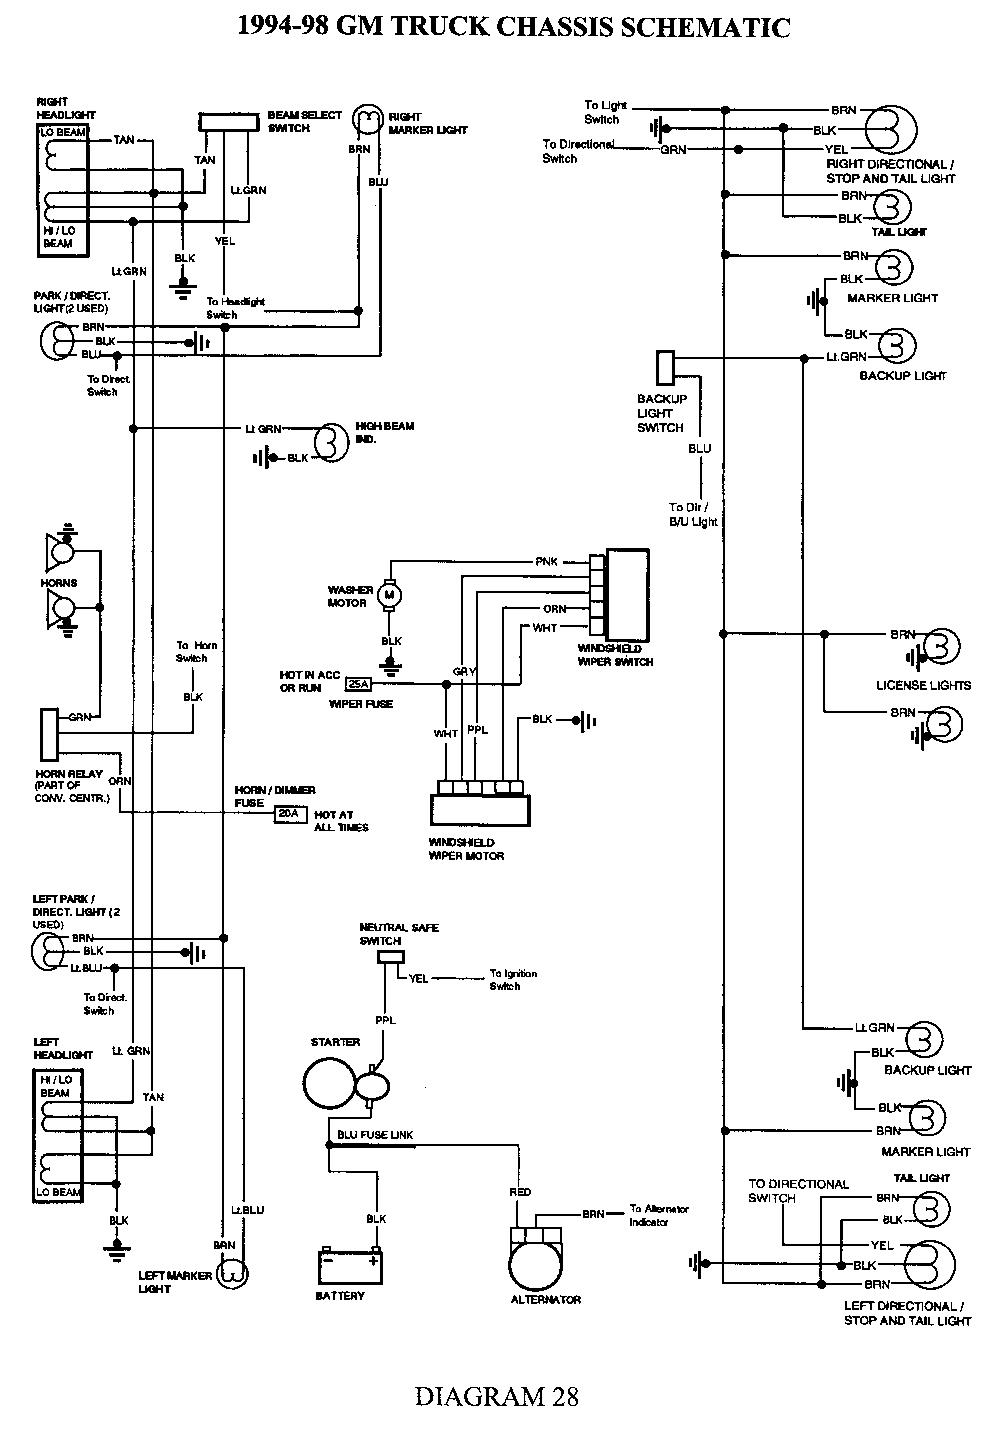 1998 chevy tahoe wiring diagram Download-Repair Guides Wiring Diagrams Wiring Diagrams 1998 Chevy Tahoe Wiring Diagram New Cruise Control & 15-g